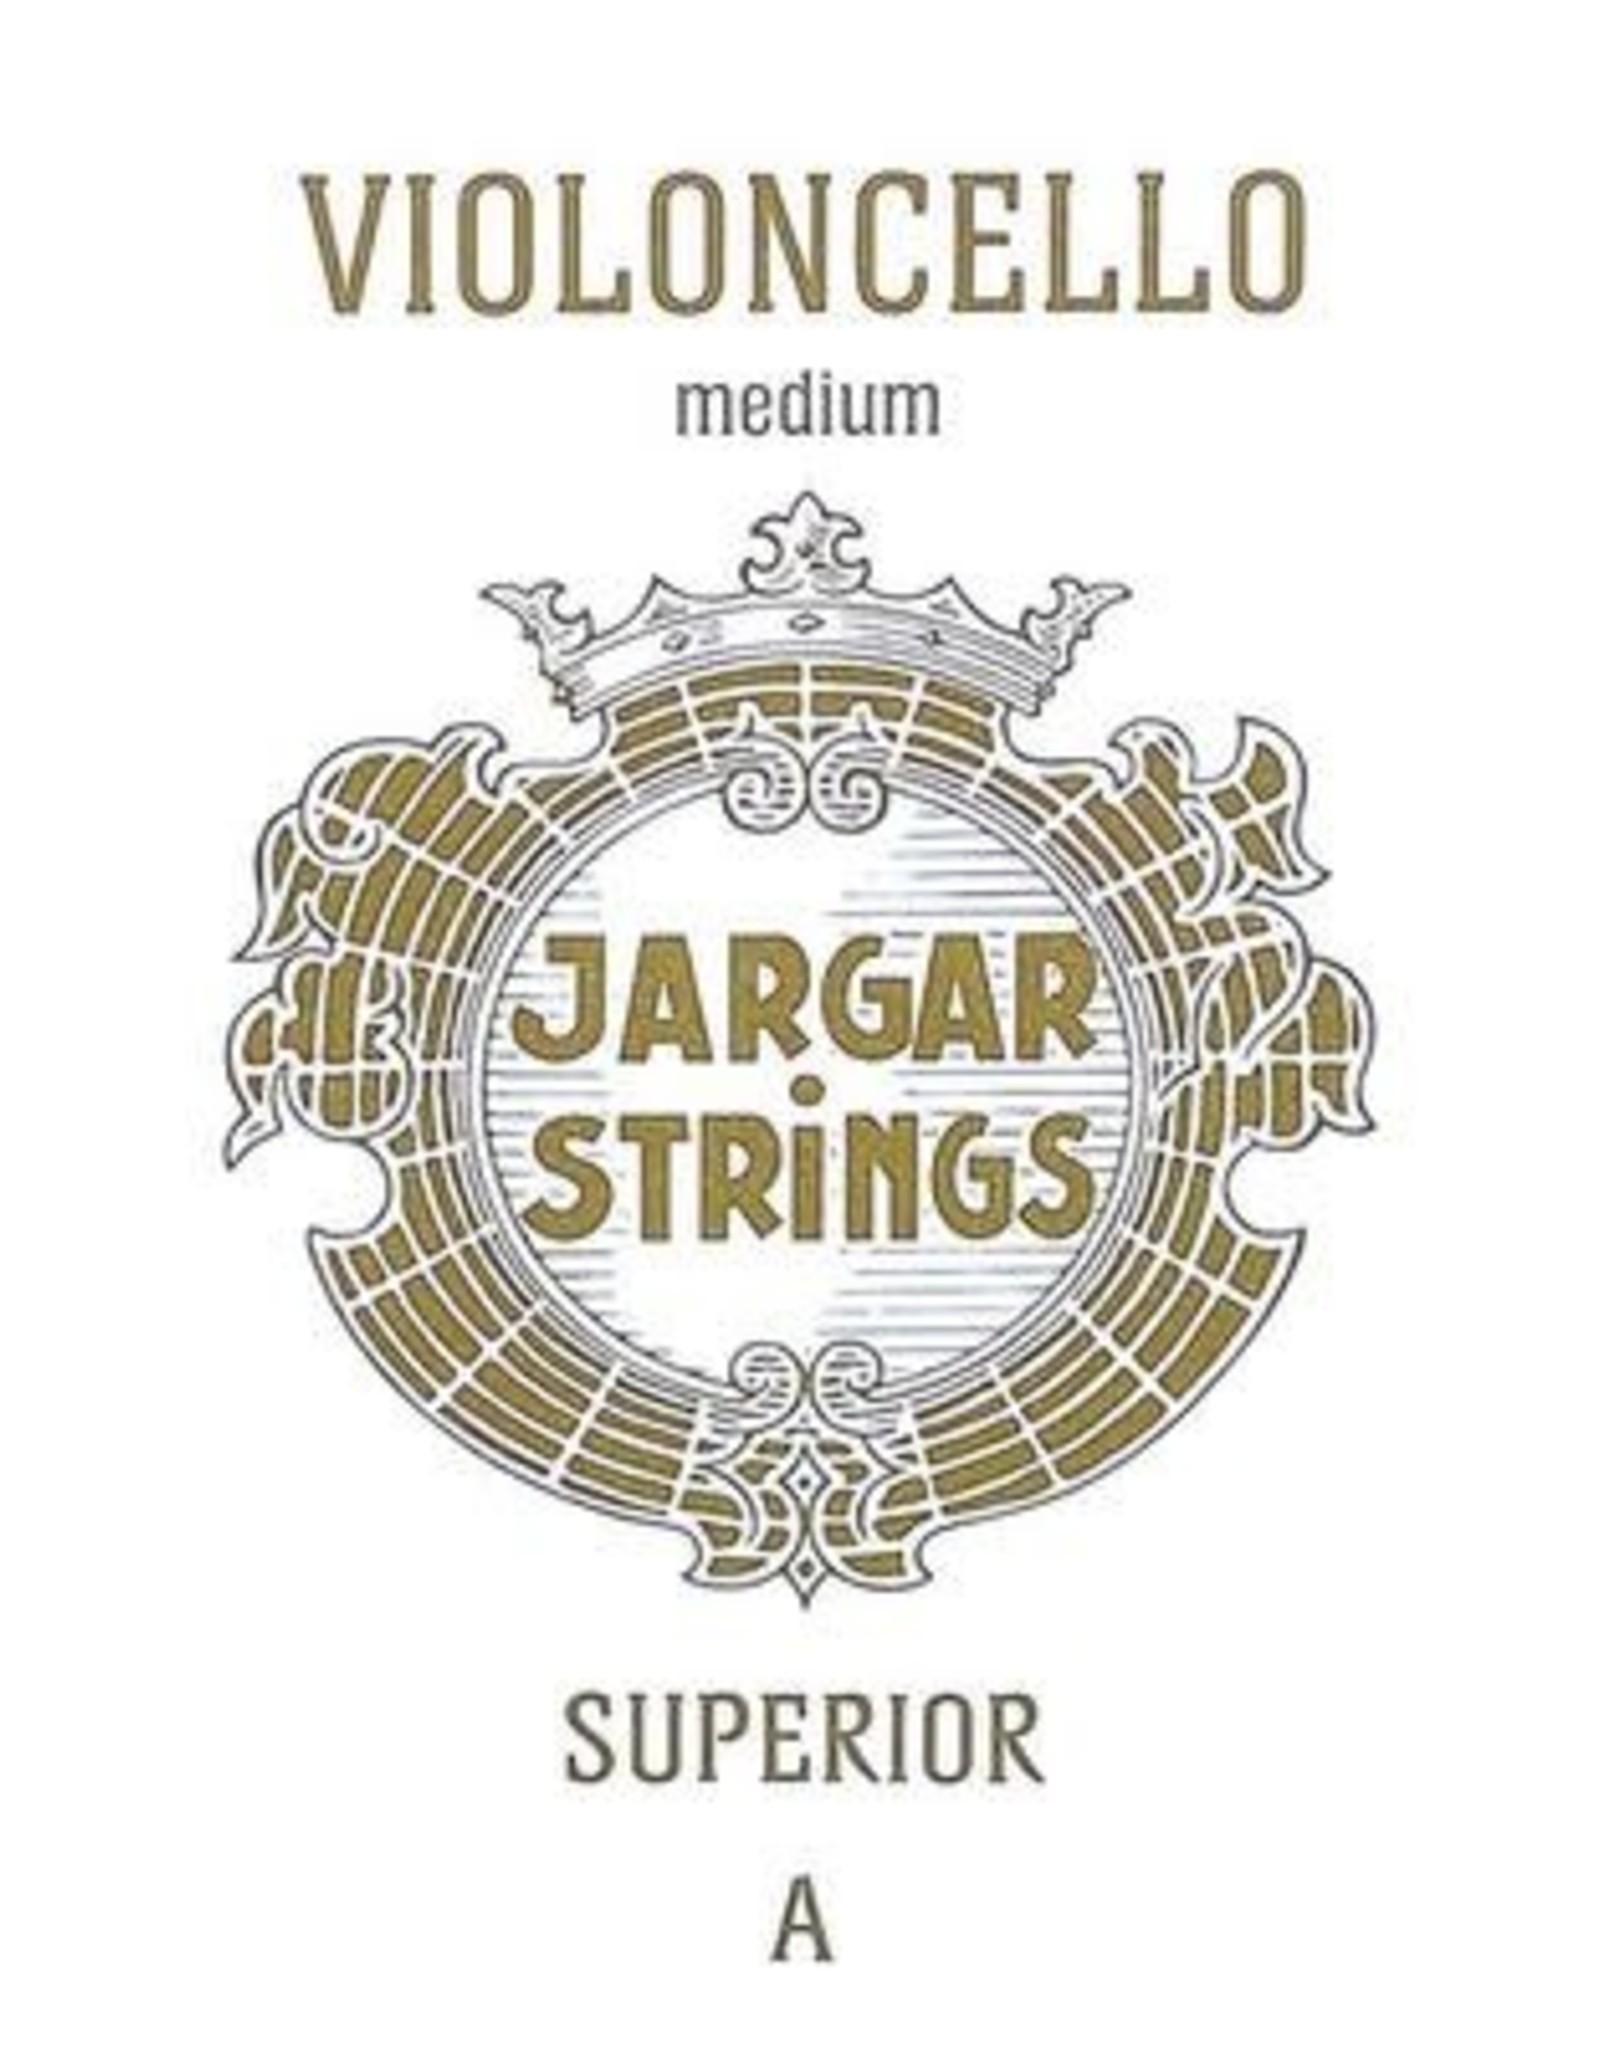 JARGAR cellosnaar, la (A-1), 4/4 medium, superior - art. JCE-ASP-BL